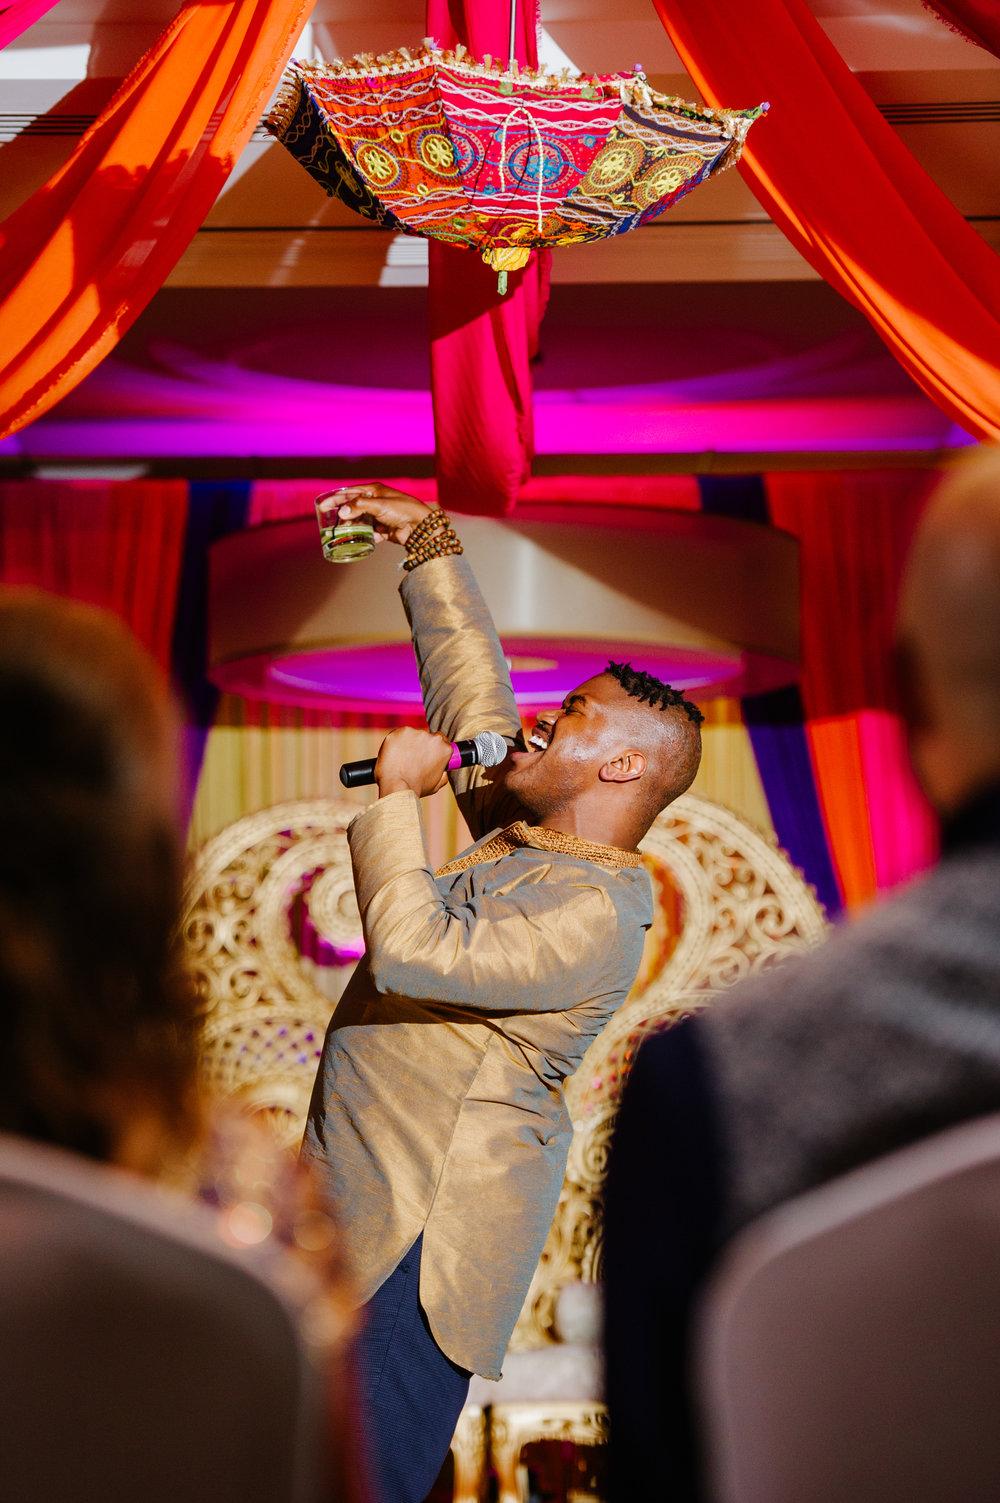 Koul_Wedding_CarolineLimaPhotography_2018_009.jpg